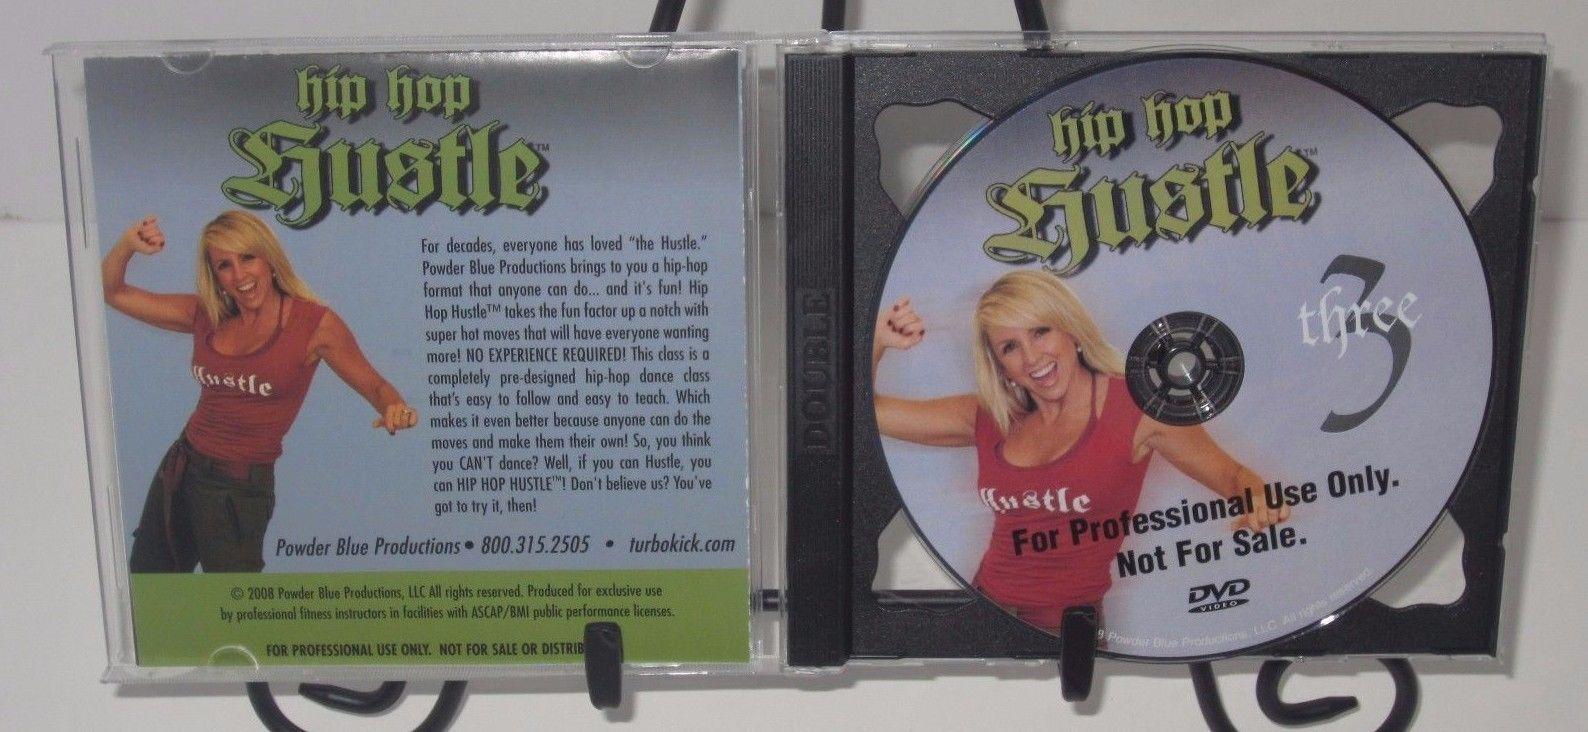 HIP HOP HUSTLE Vol. 3 Workout DVD - Chalene Johnson - Powder Blue Productions!